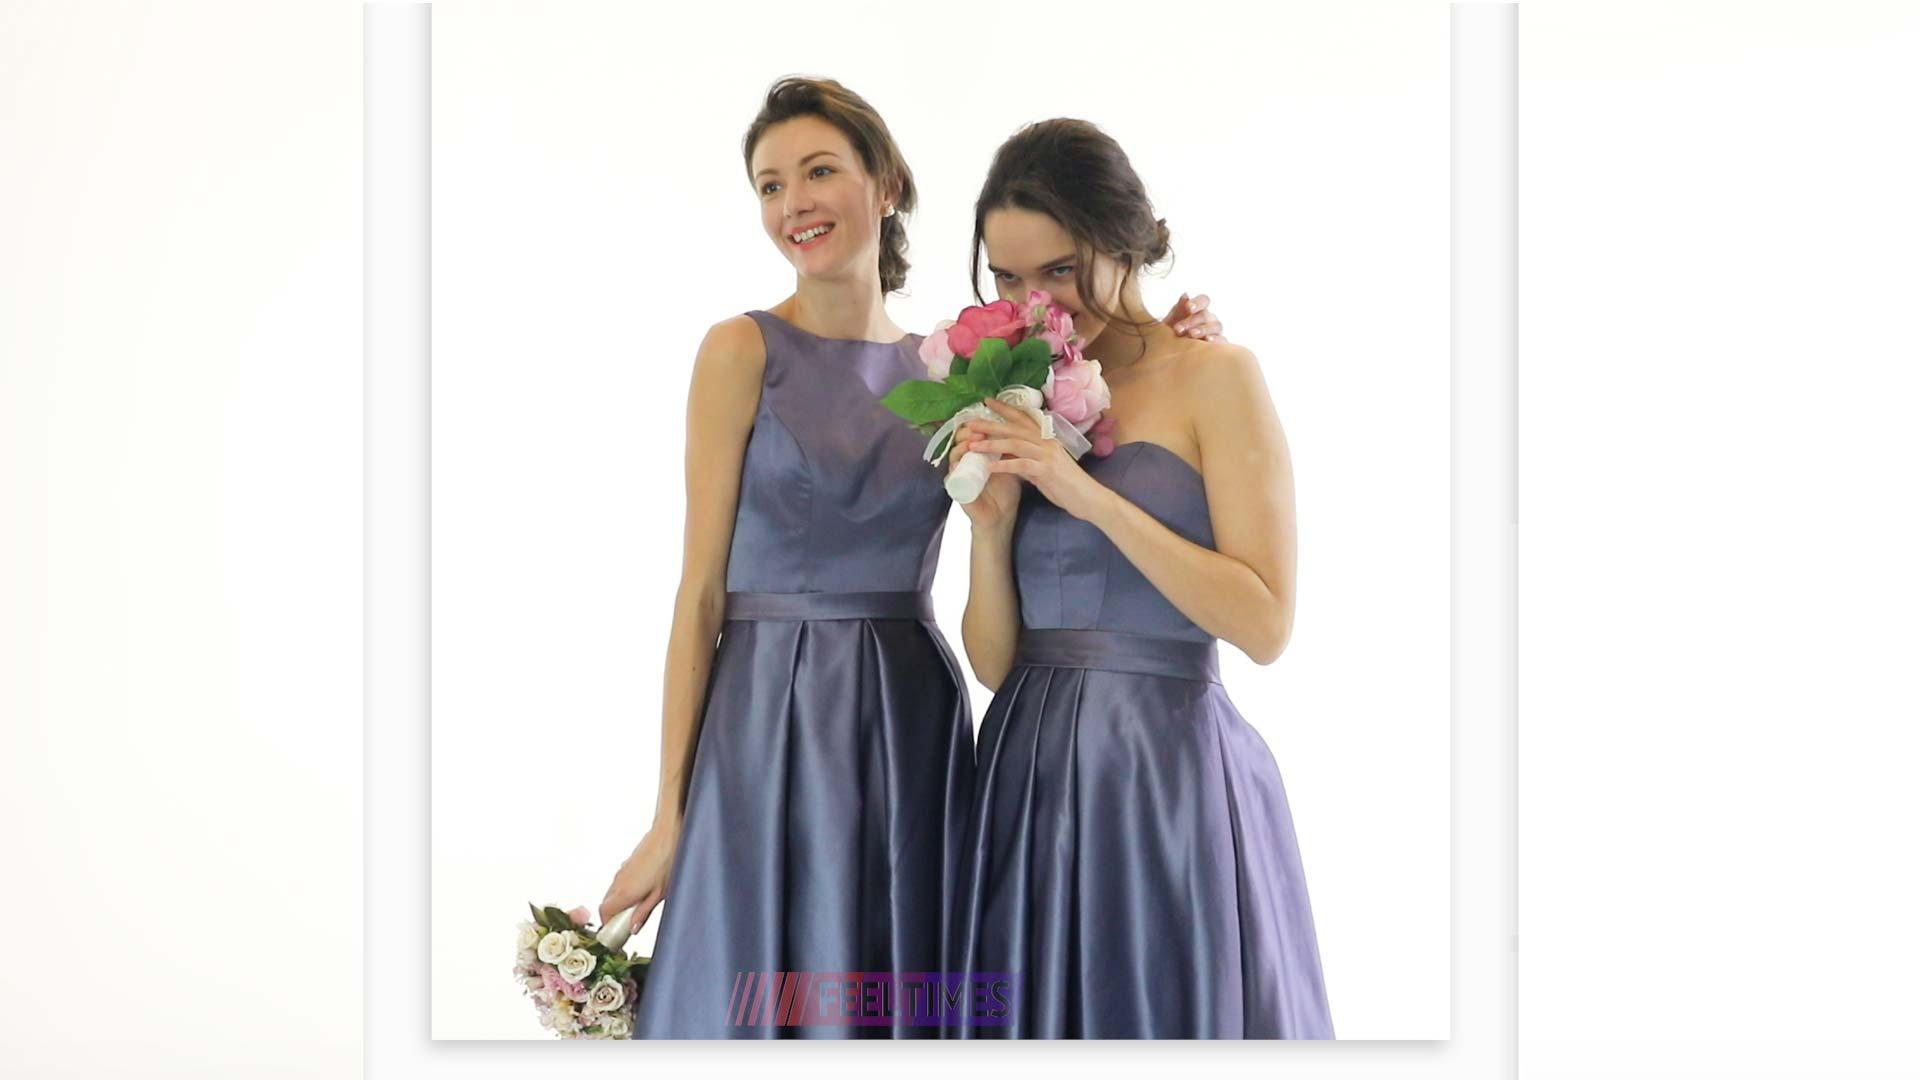 Bridesmaid Dresses M18097B & M18098B丨Satin Bridesmaid Dresses - FeelTimes